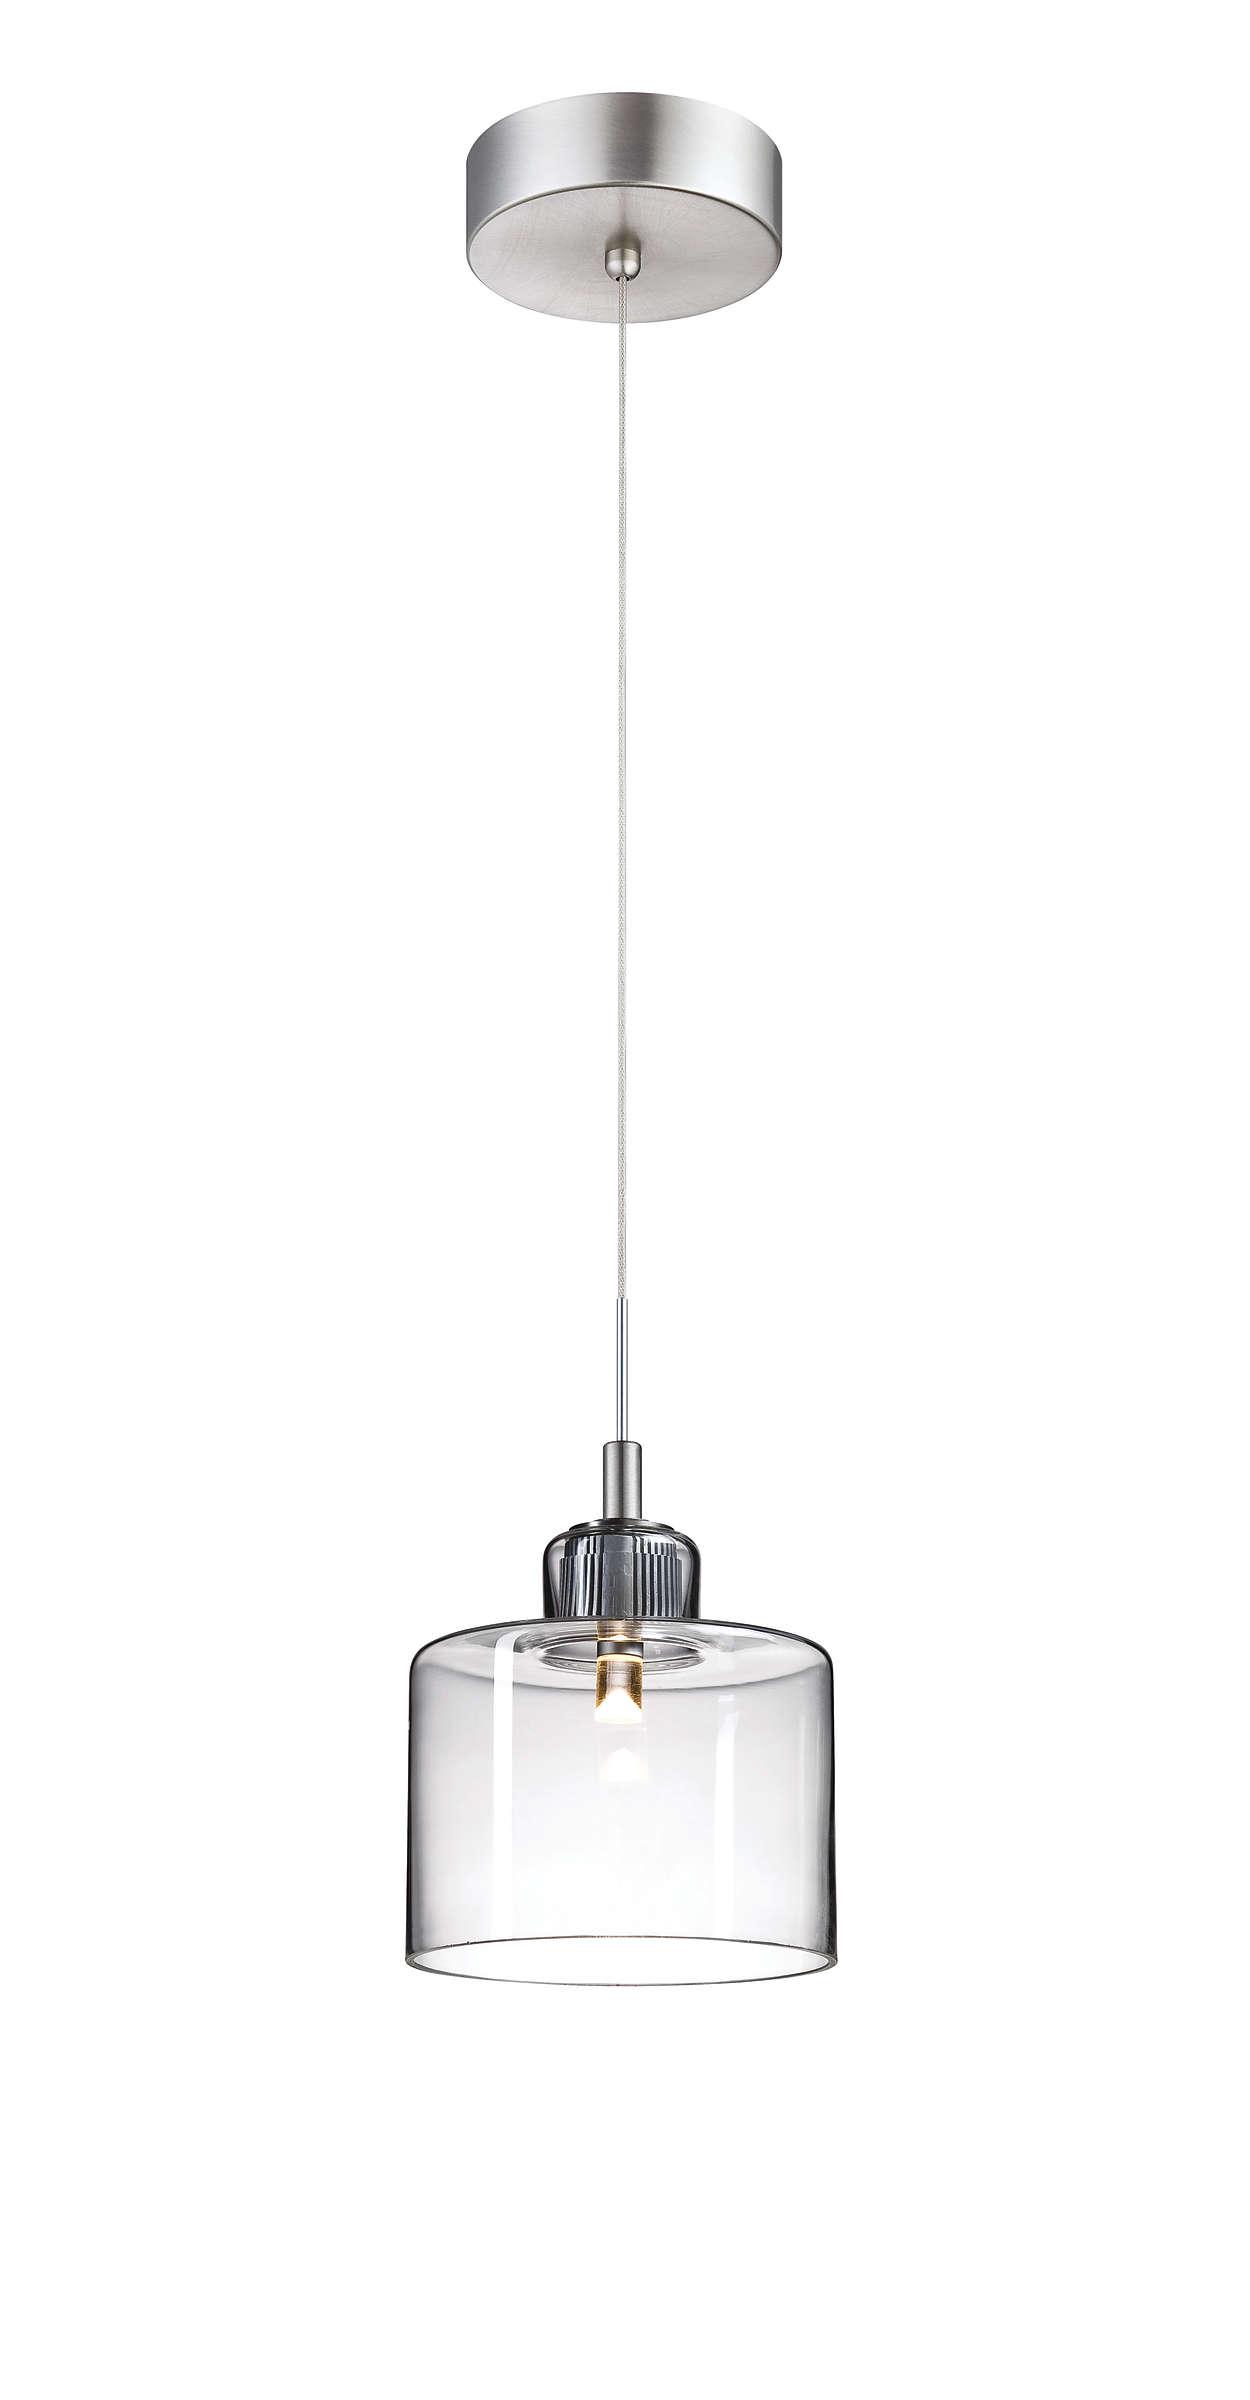 Harmonize 1-light LED pendant, Satin Nickel finish